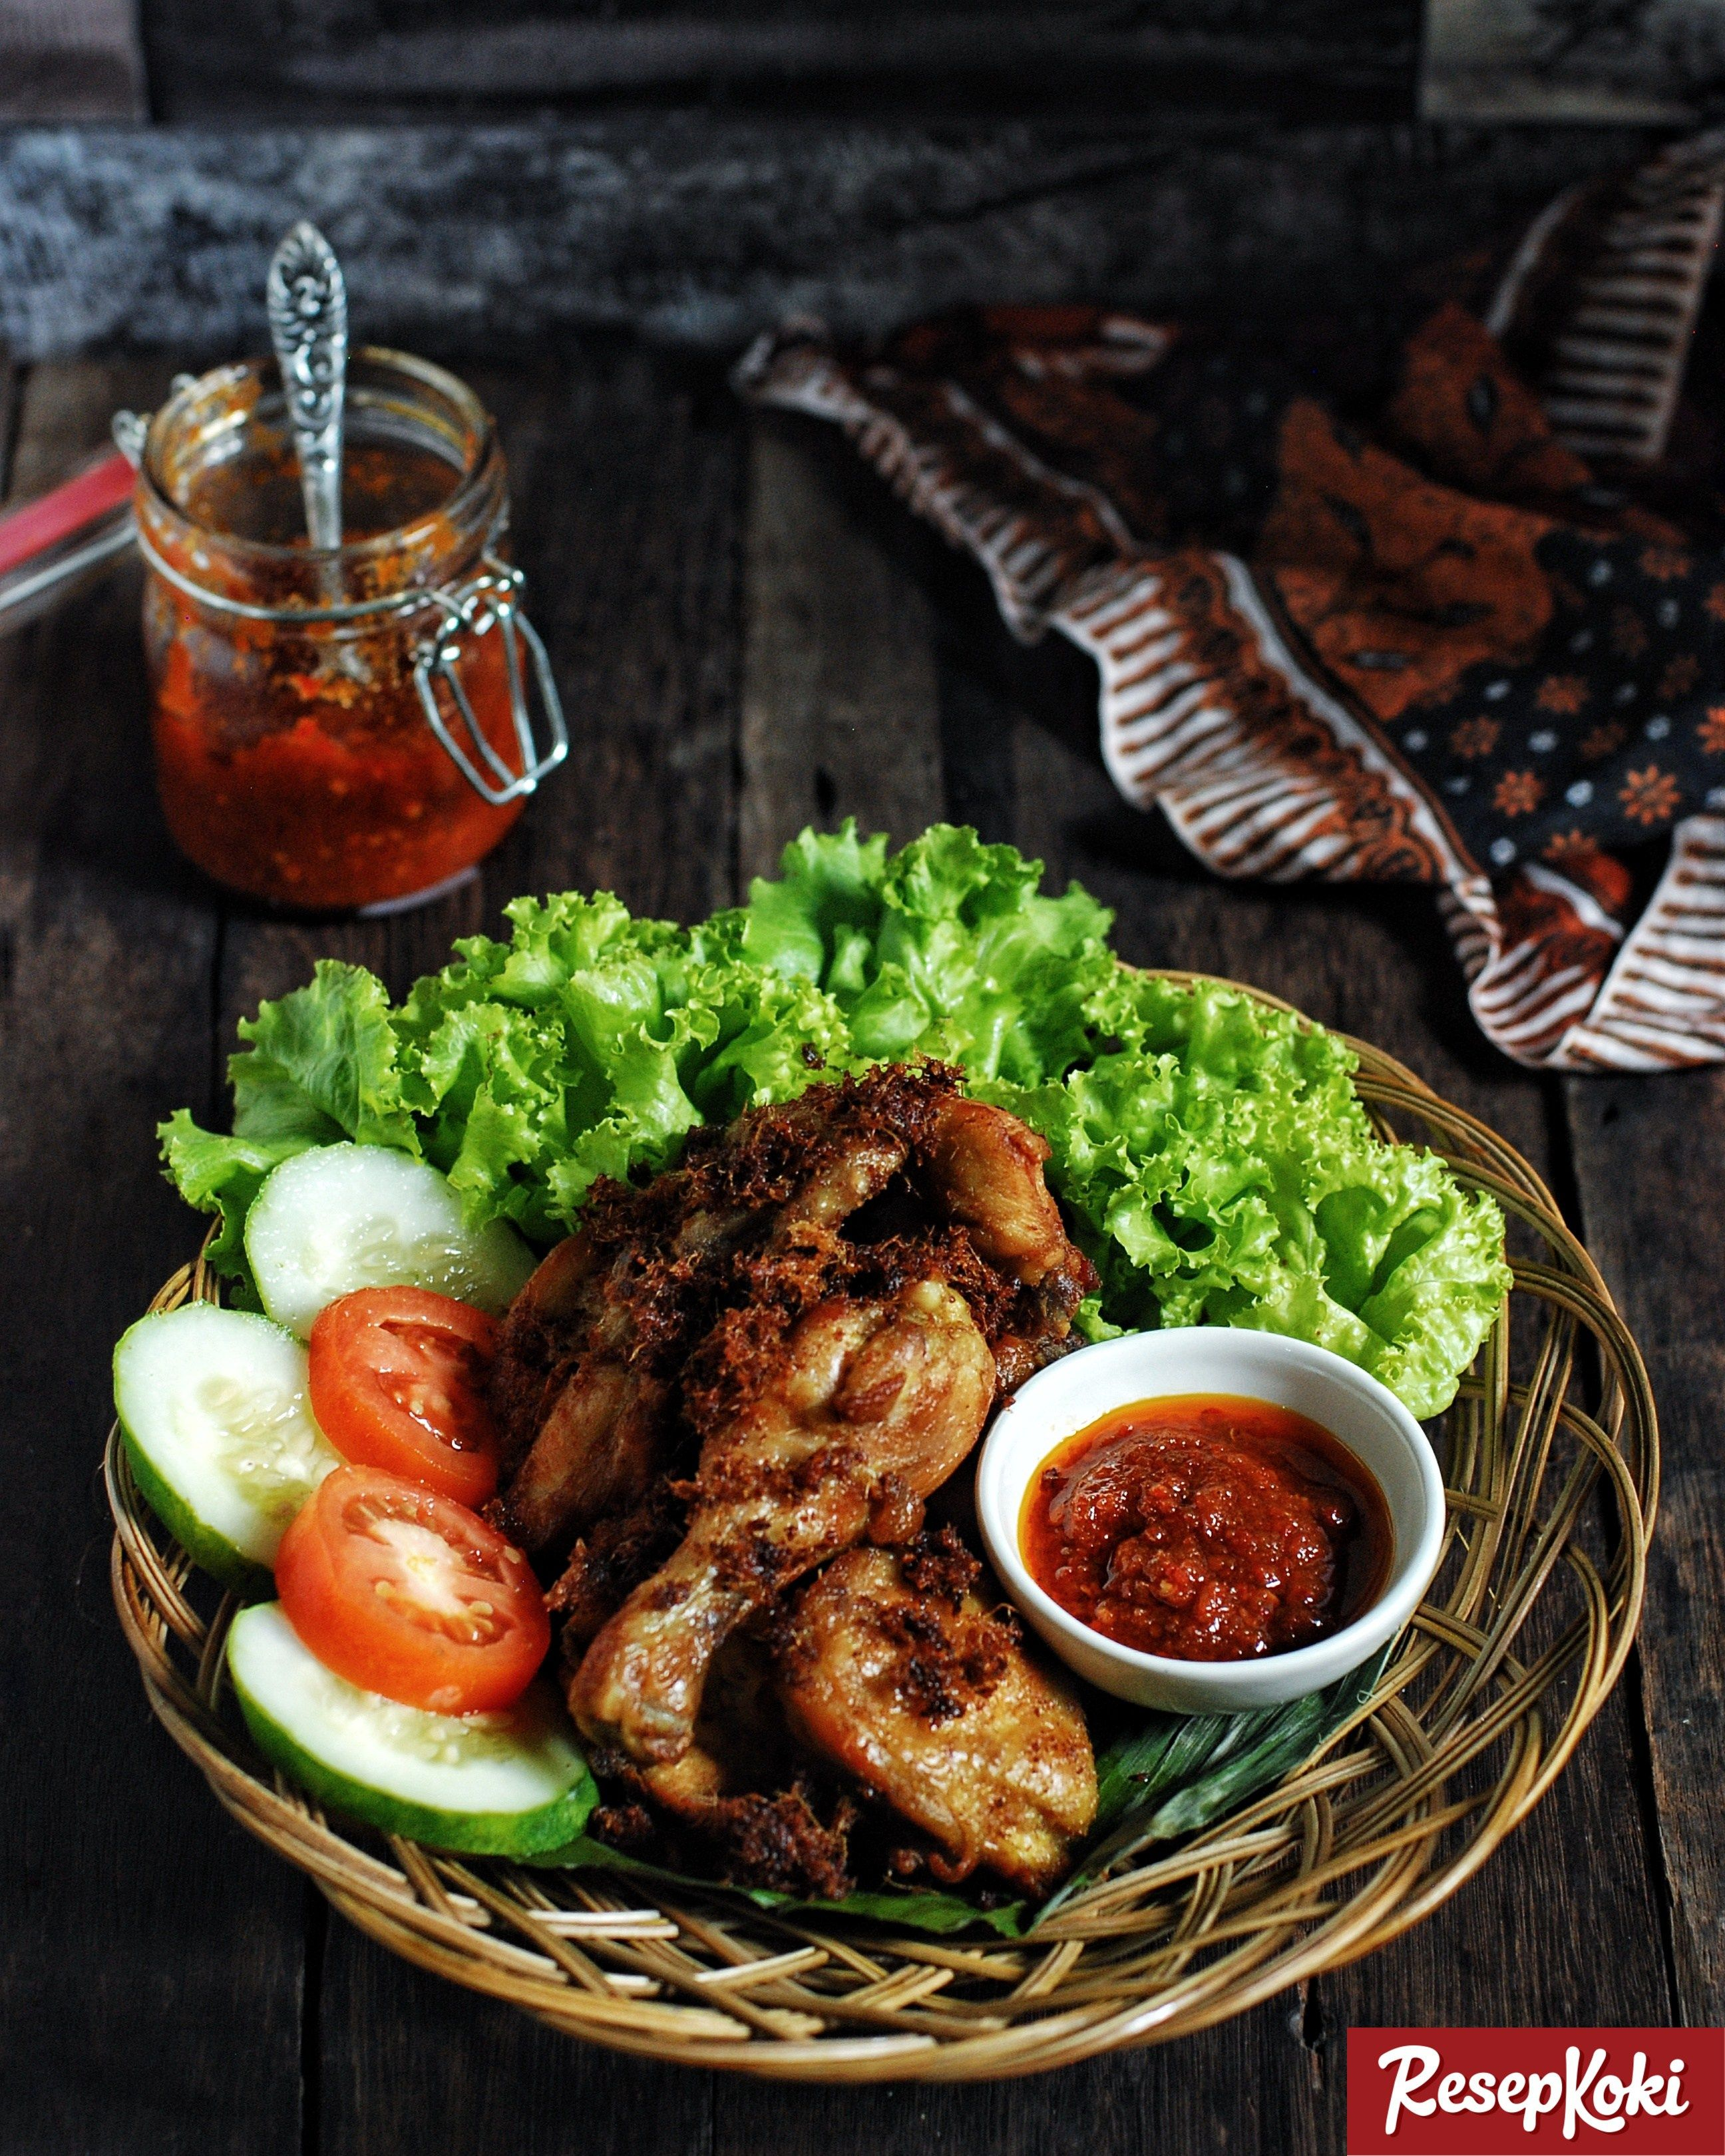 Ikuti 7 Langkah Membuat Ayam Ungkep Agar Lezat Gurih Dan Empuk Resep Masakan Masakan Ayam Goreng